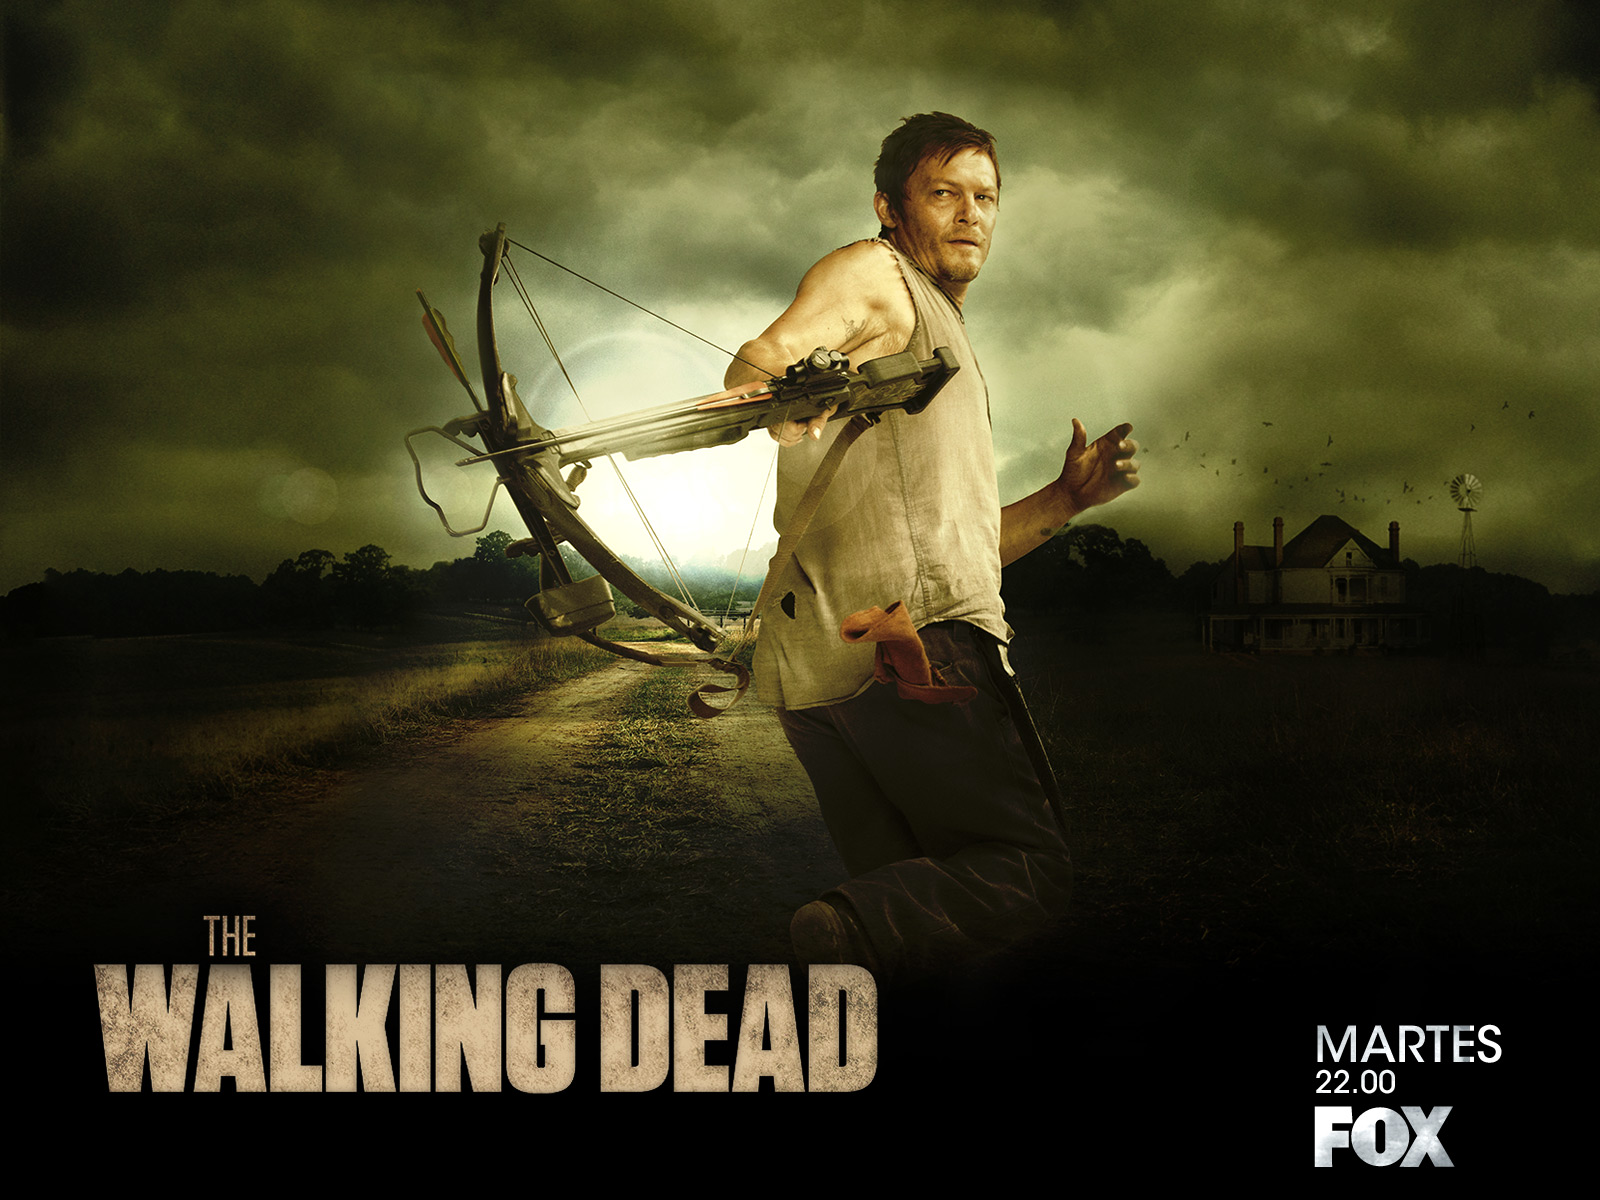 Daryl Dixon - the-walking-dead Wallpaper